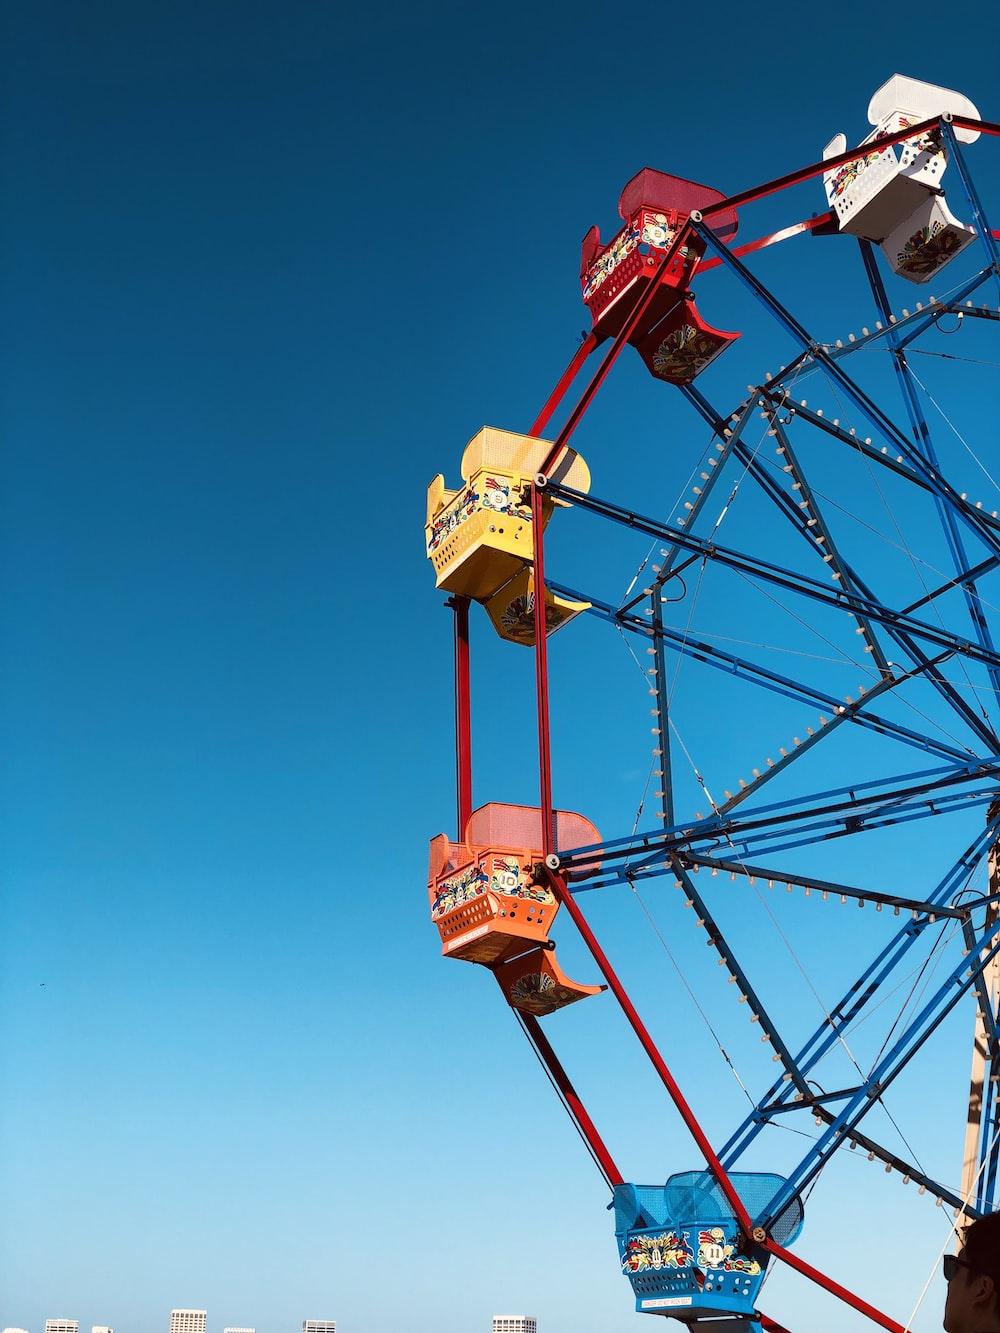 multicolored ferris wheel at daytime